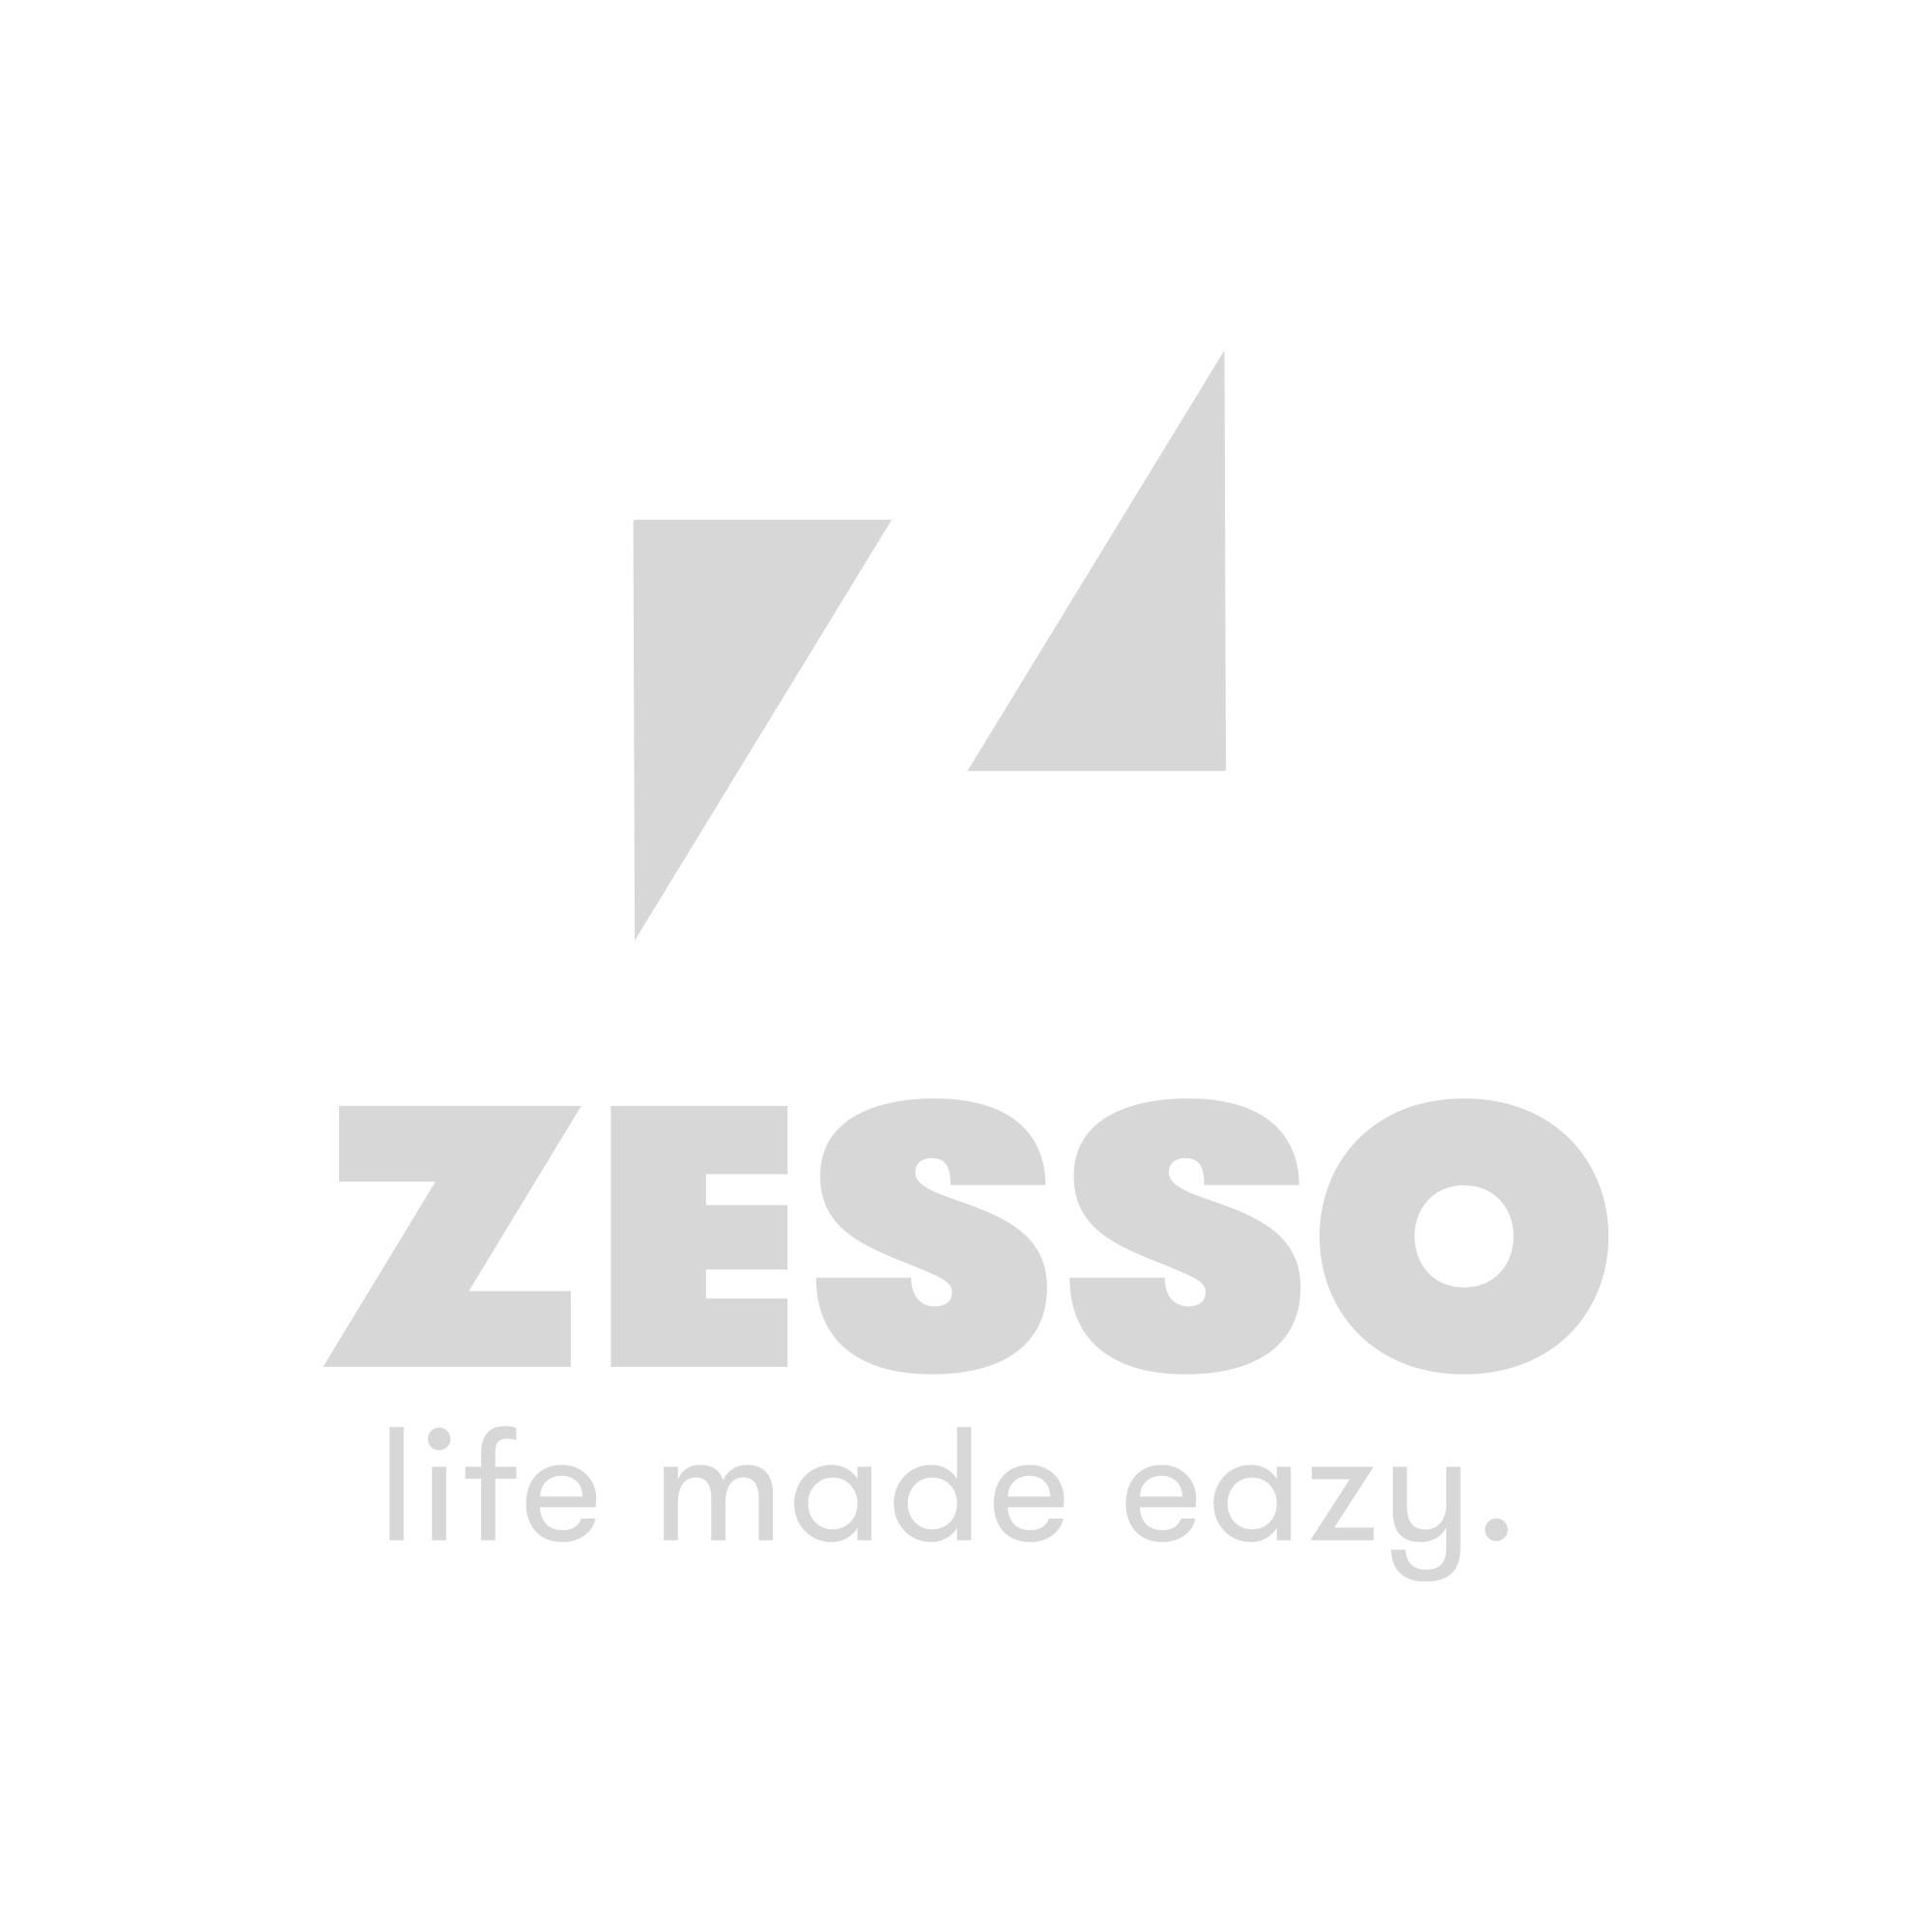 Lamborghini Aventador Elektrische Kinderauto 3 - 8 Jaar 6 V Wit